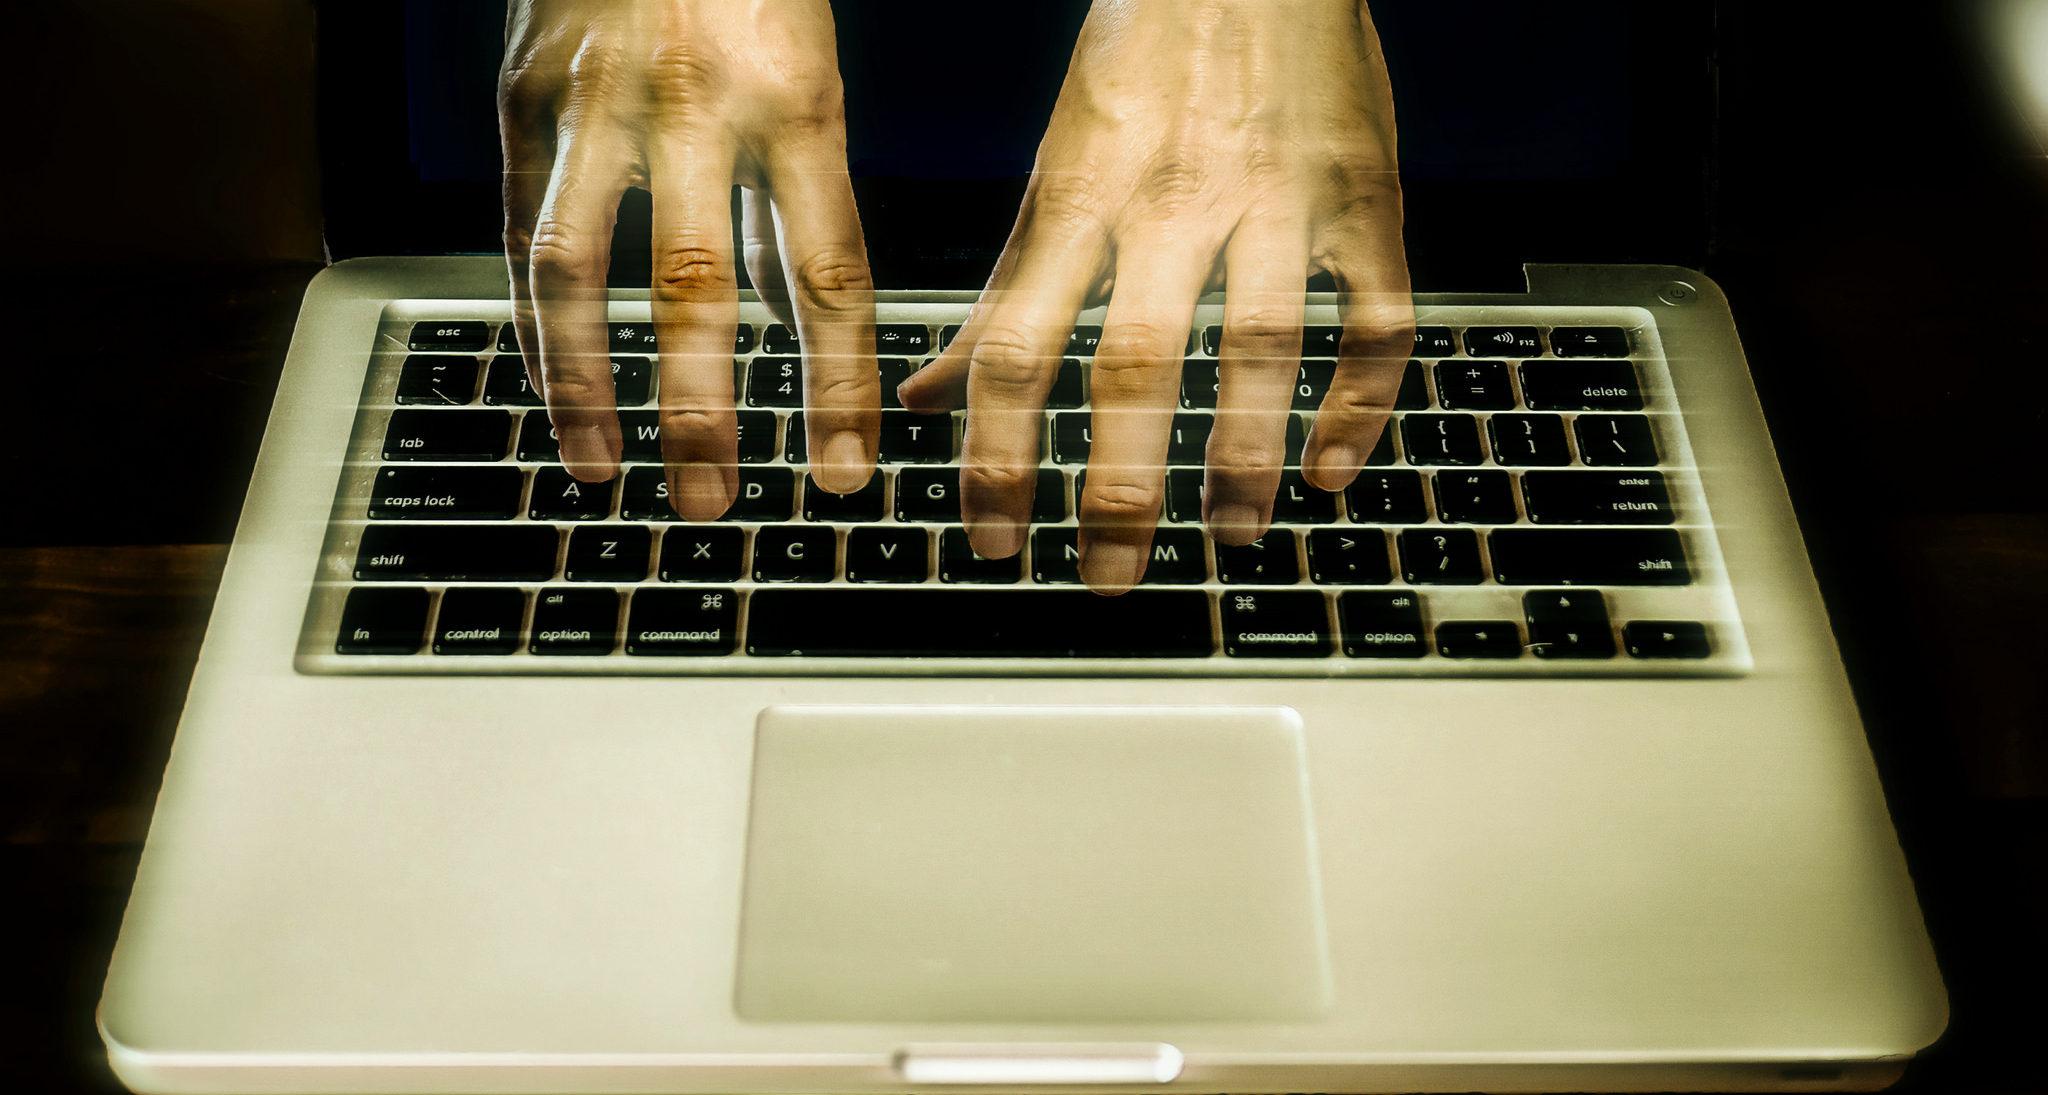 Data Protection Regulation. Photo cred -Blogtrepreneur, Computer Data Hacker